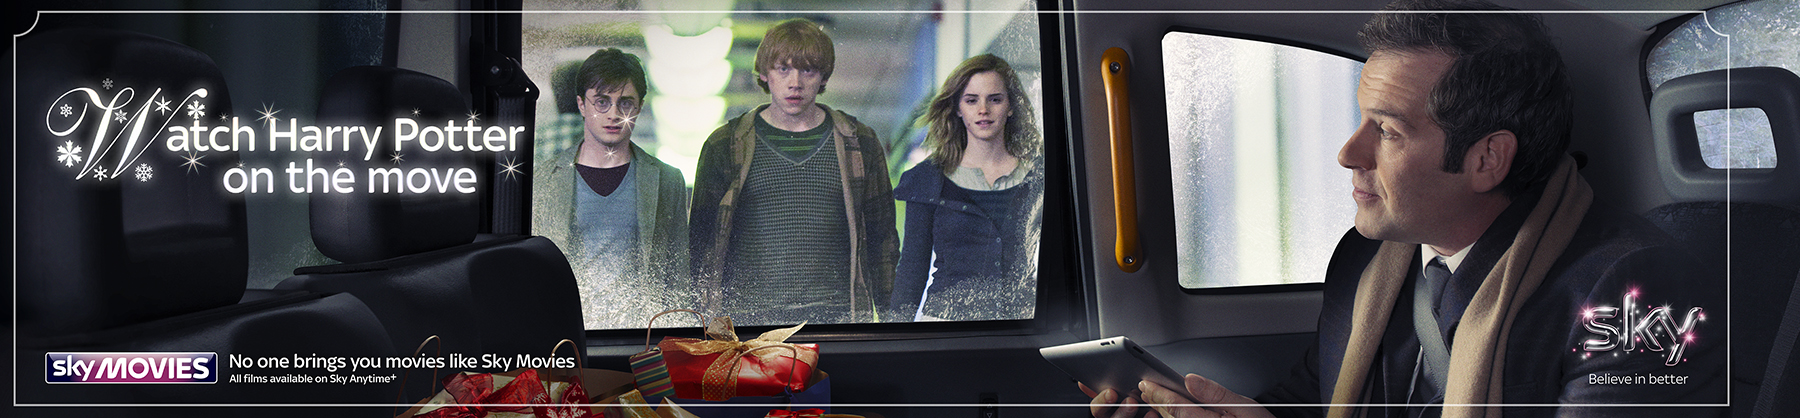 0409_Harry_Potter_96s